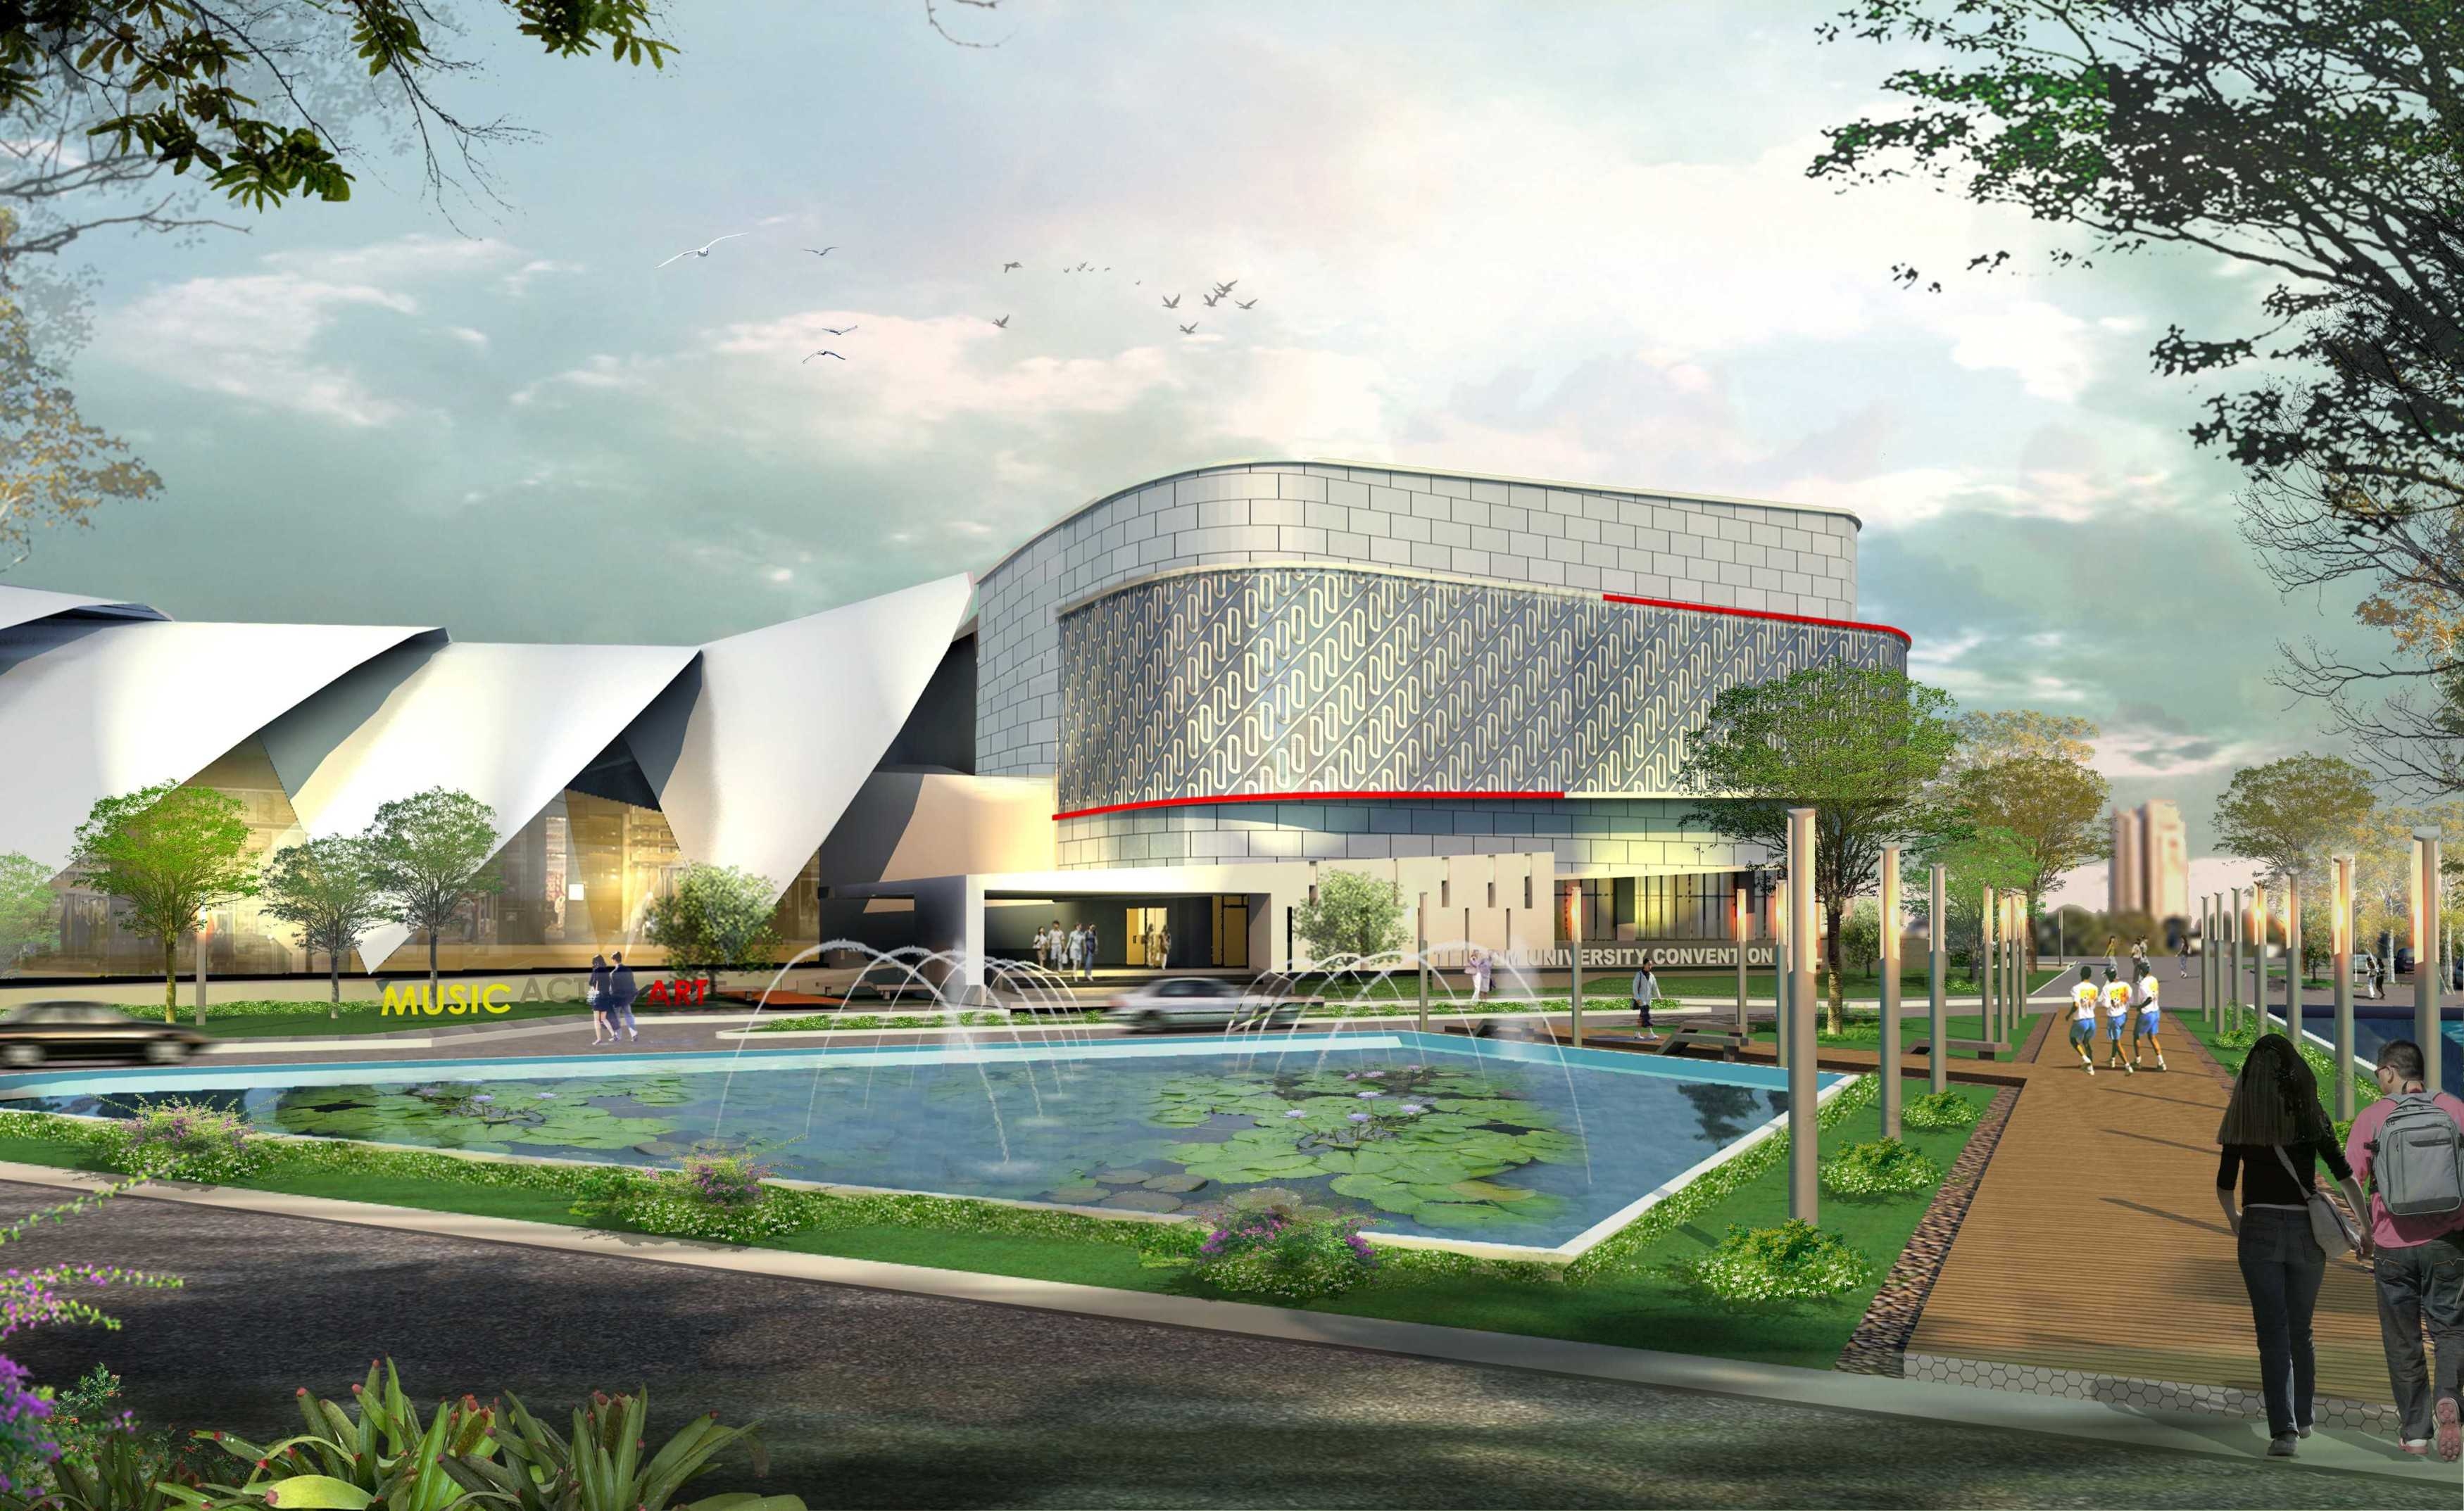 Arah Studio Telkom University Convention Hall Kota Bandung, Jawa Barat, Indonesia Kota Bandung, Jawa Barat, Indonesia Exterior View Phase 1   31704